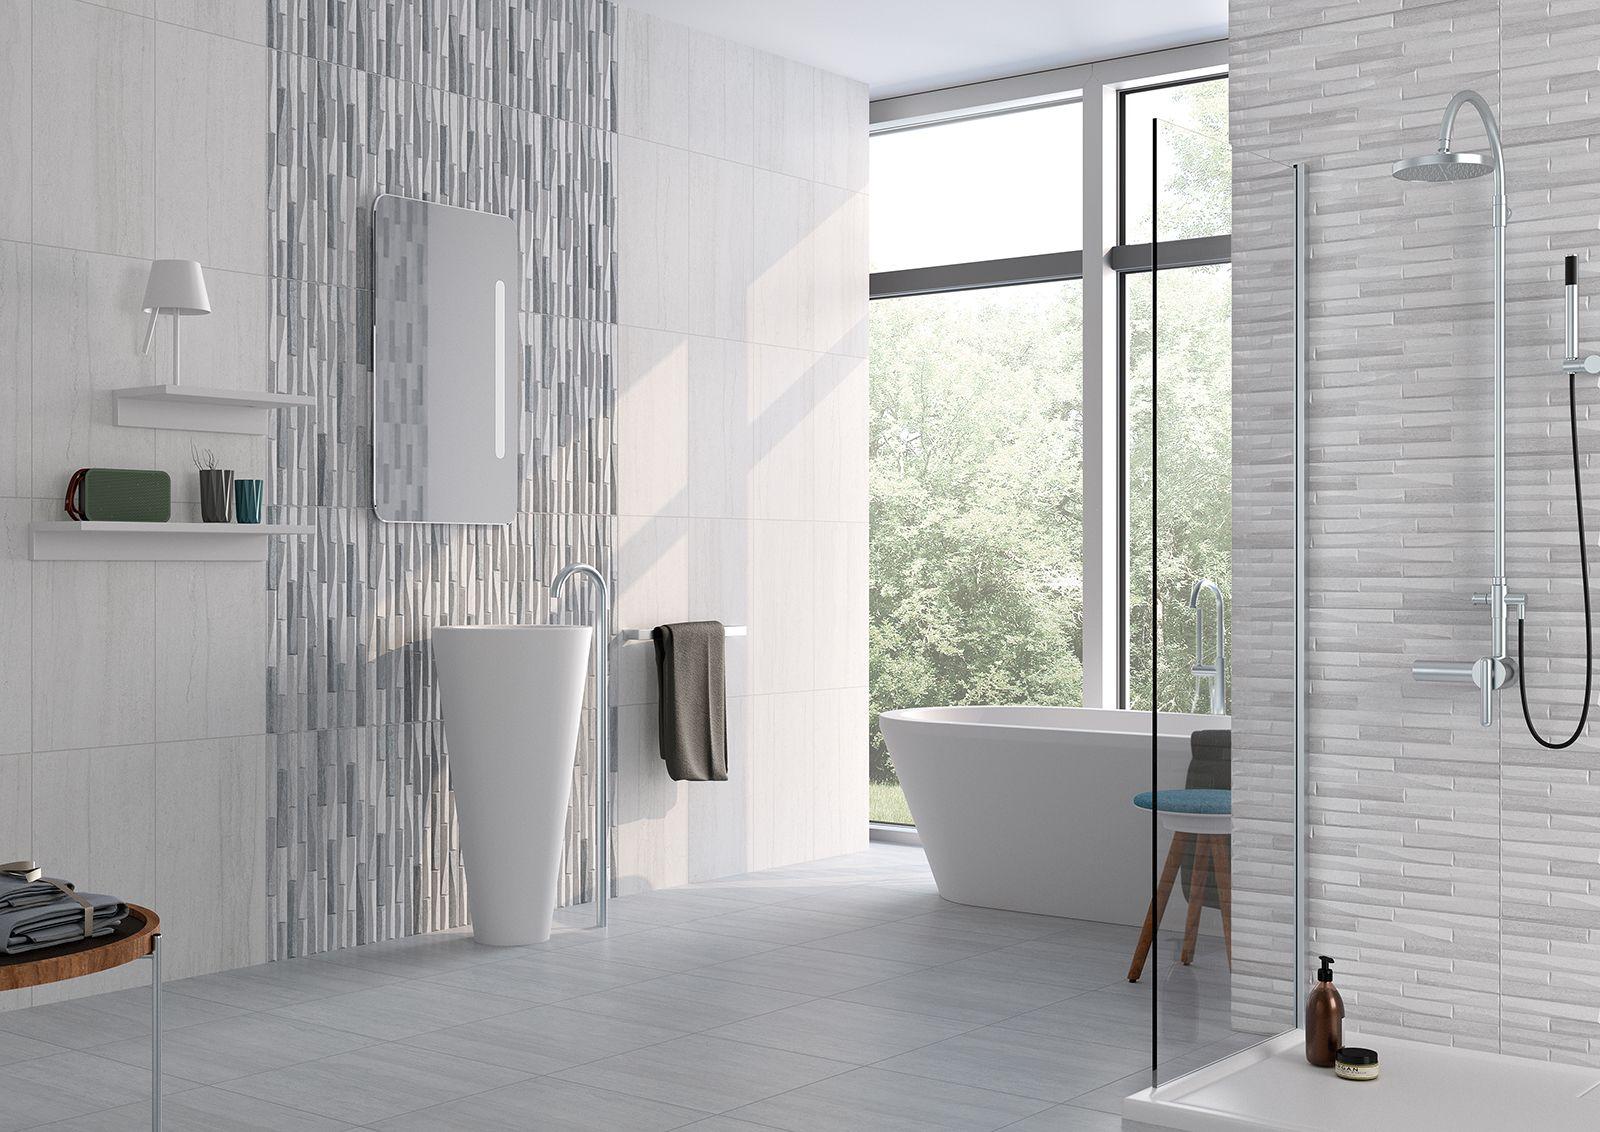 How to tile a bathroom wall | Precious Tiling